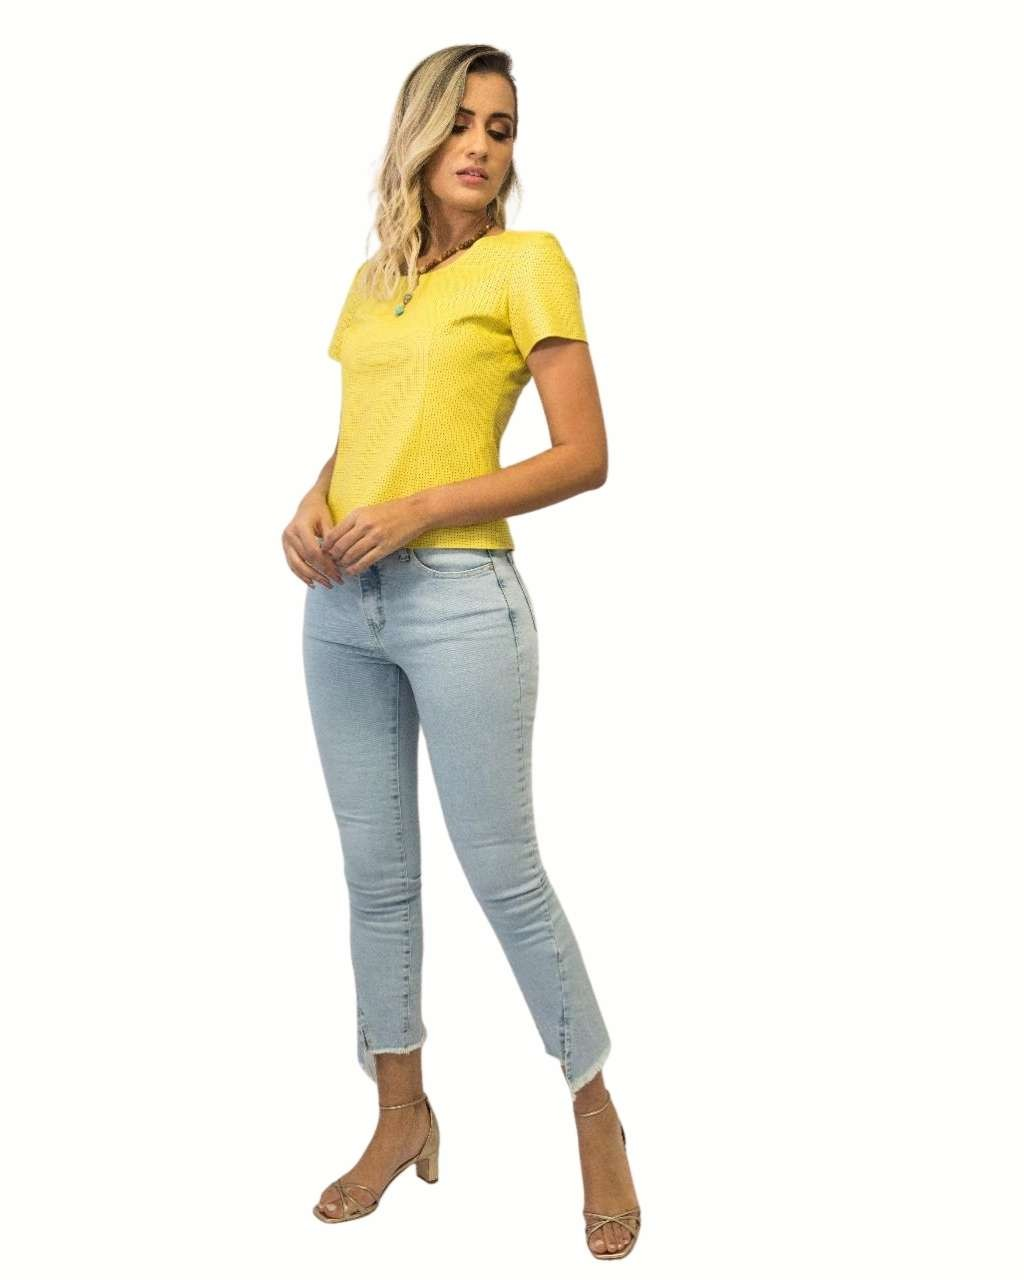 Calça Jeans Claro Exss Denim 22405 Skinny Fiturban Barra Desfiada